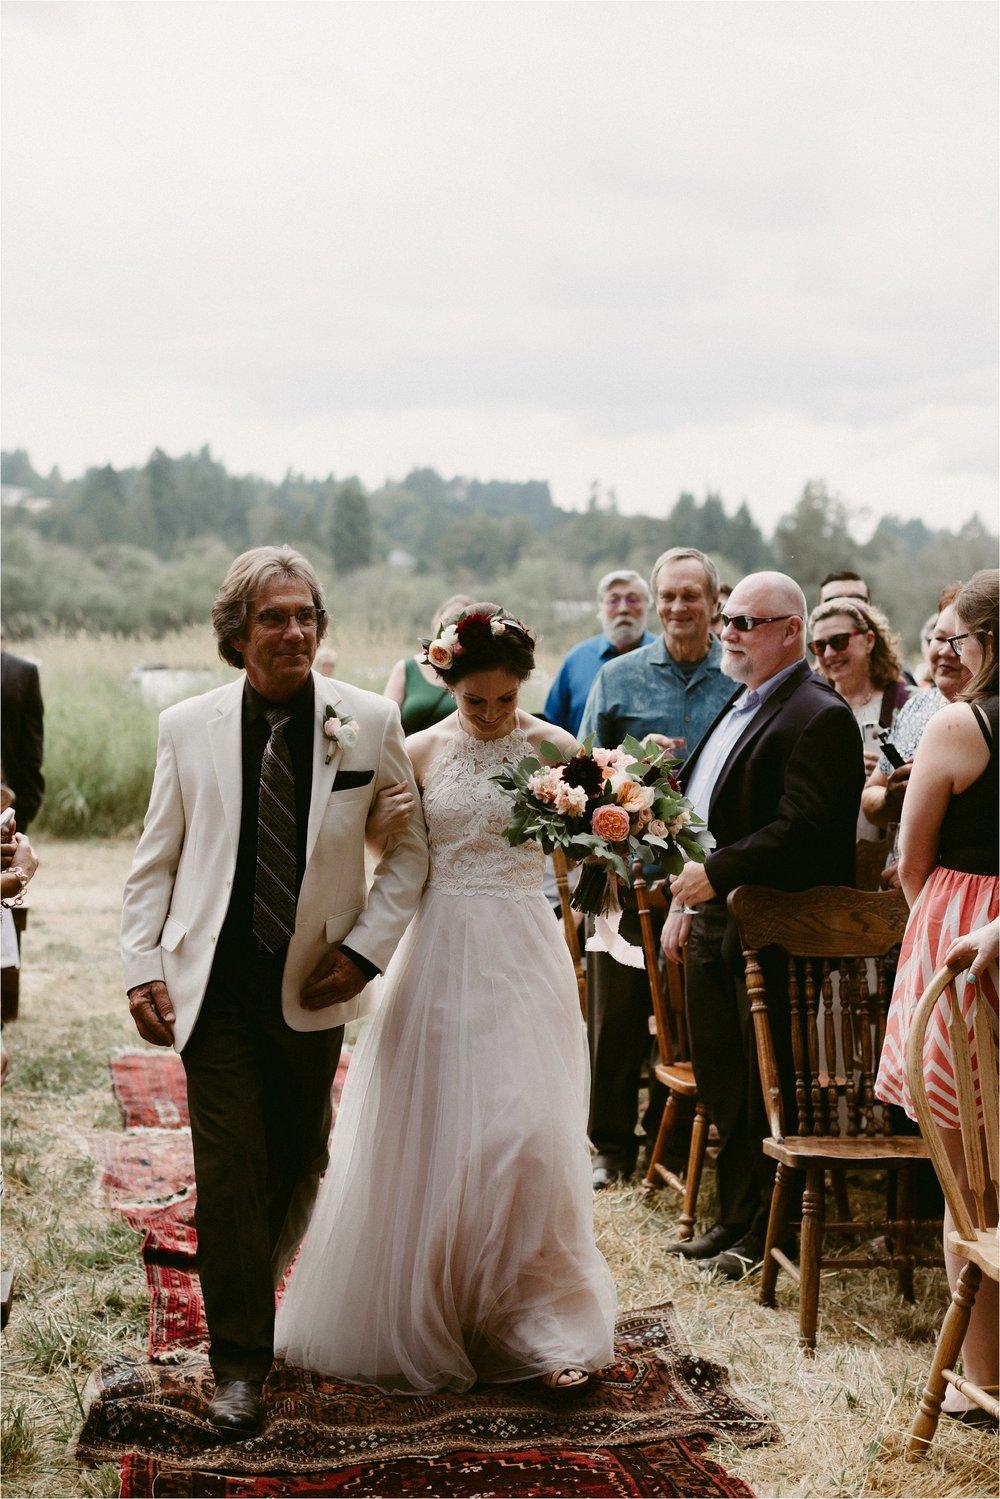 boho-hipster-indie-wedding-portland-wedding-photographer_0357.jpg